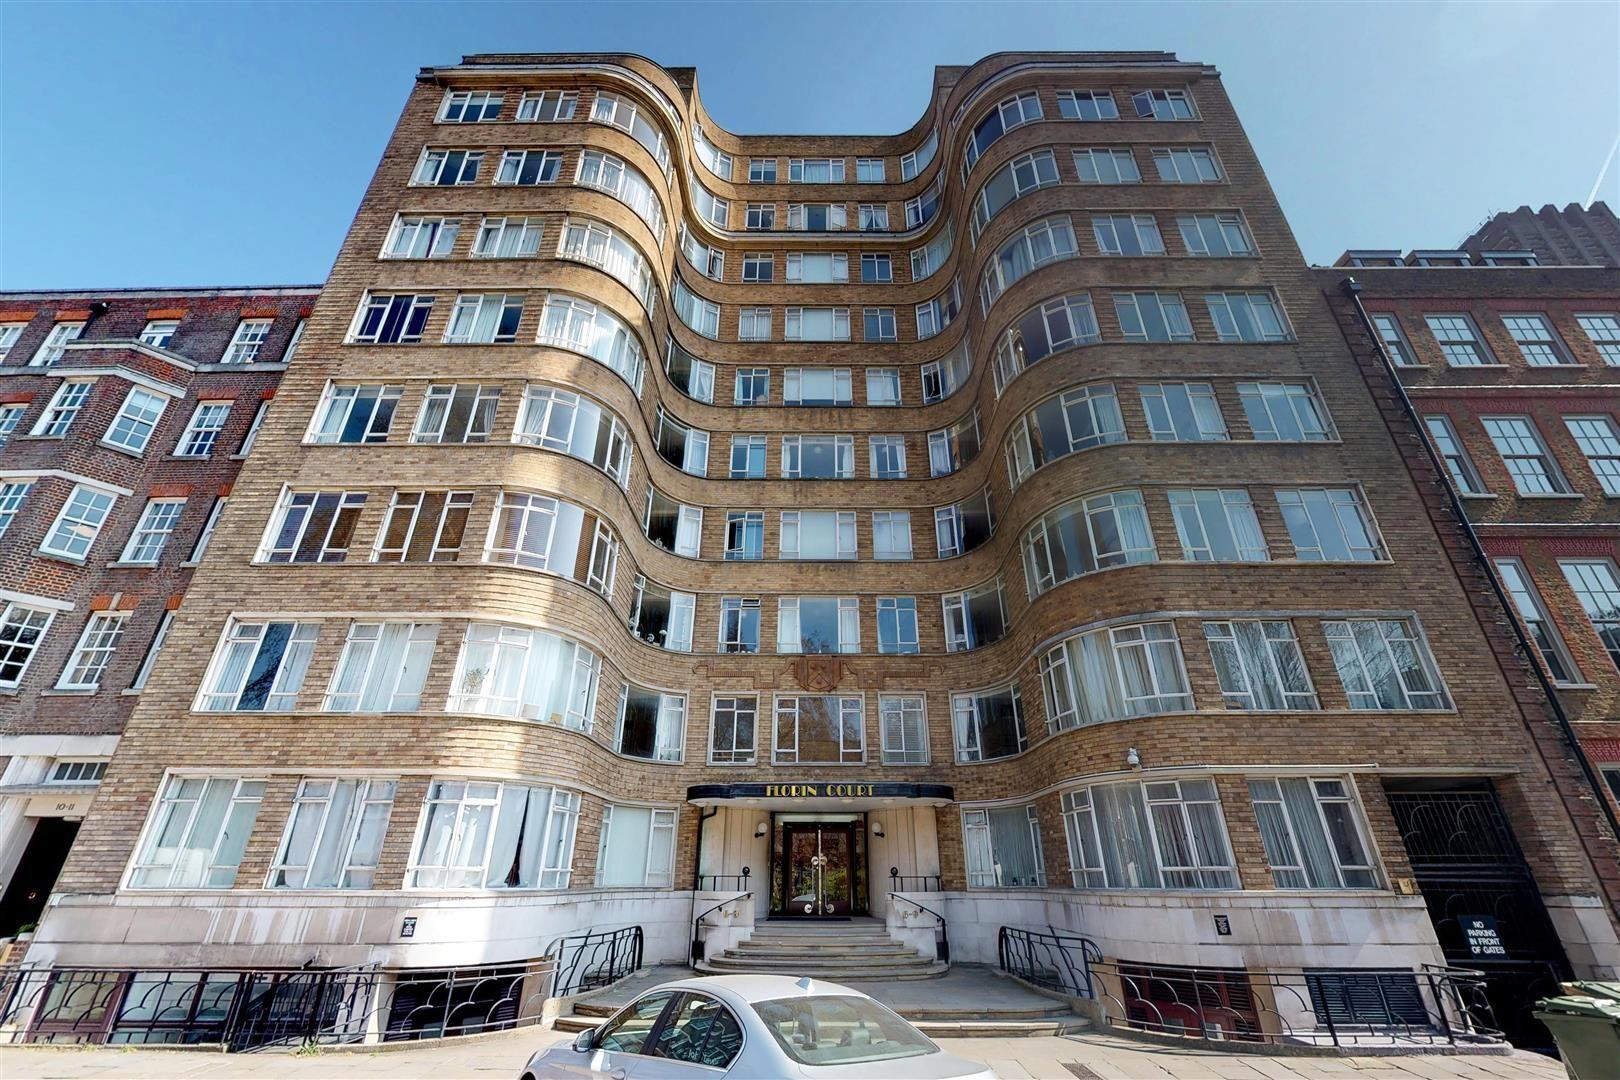 Property photo 1 of 9. Florin 4.Jpg